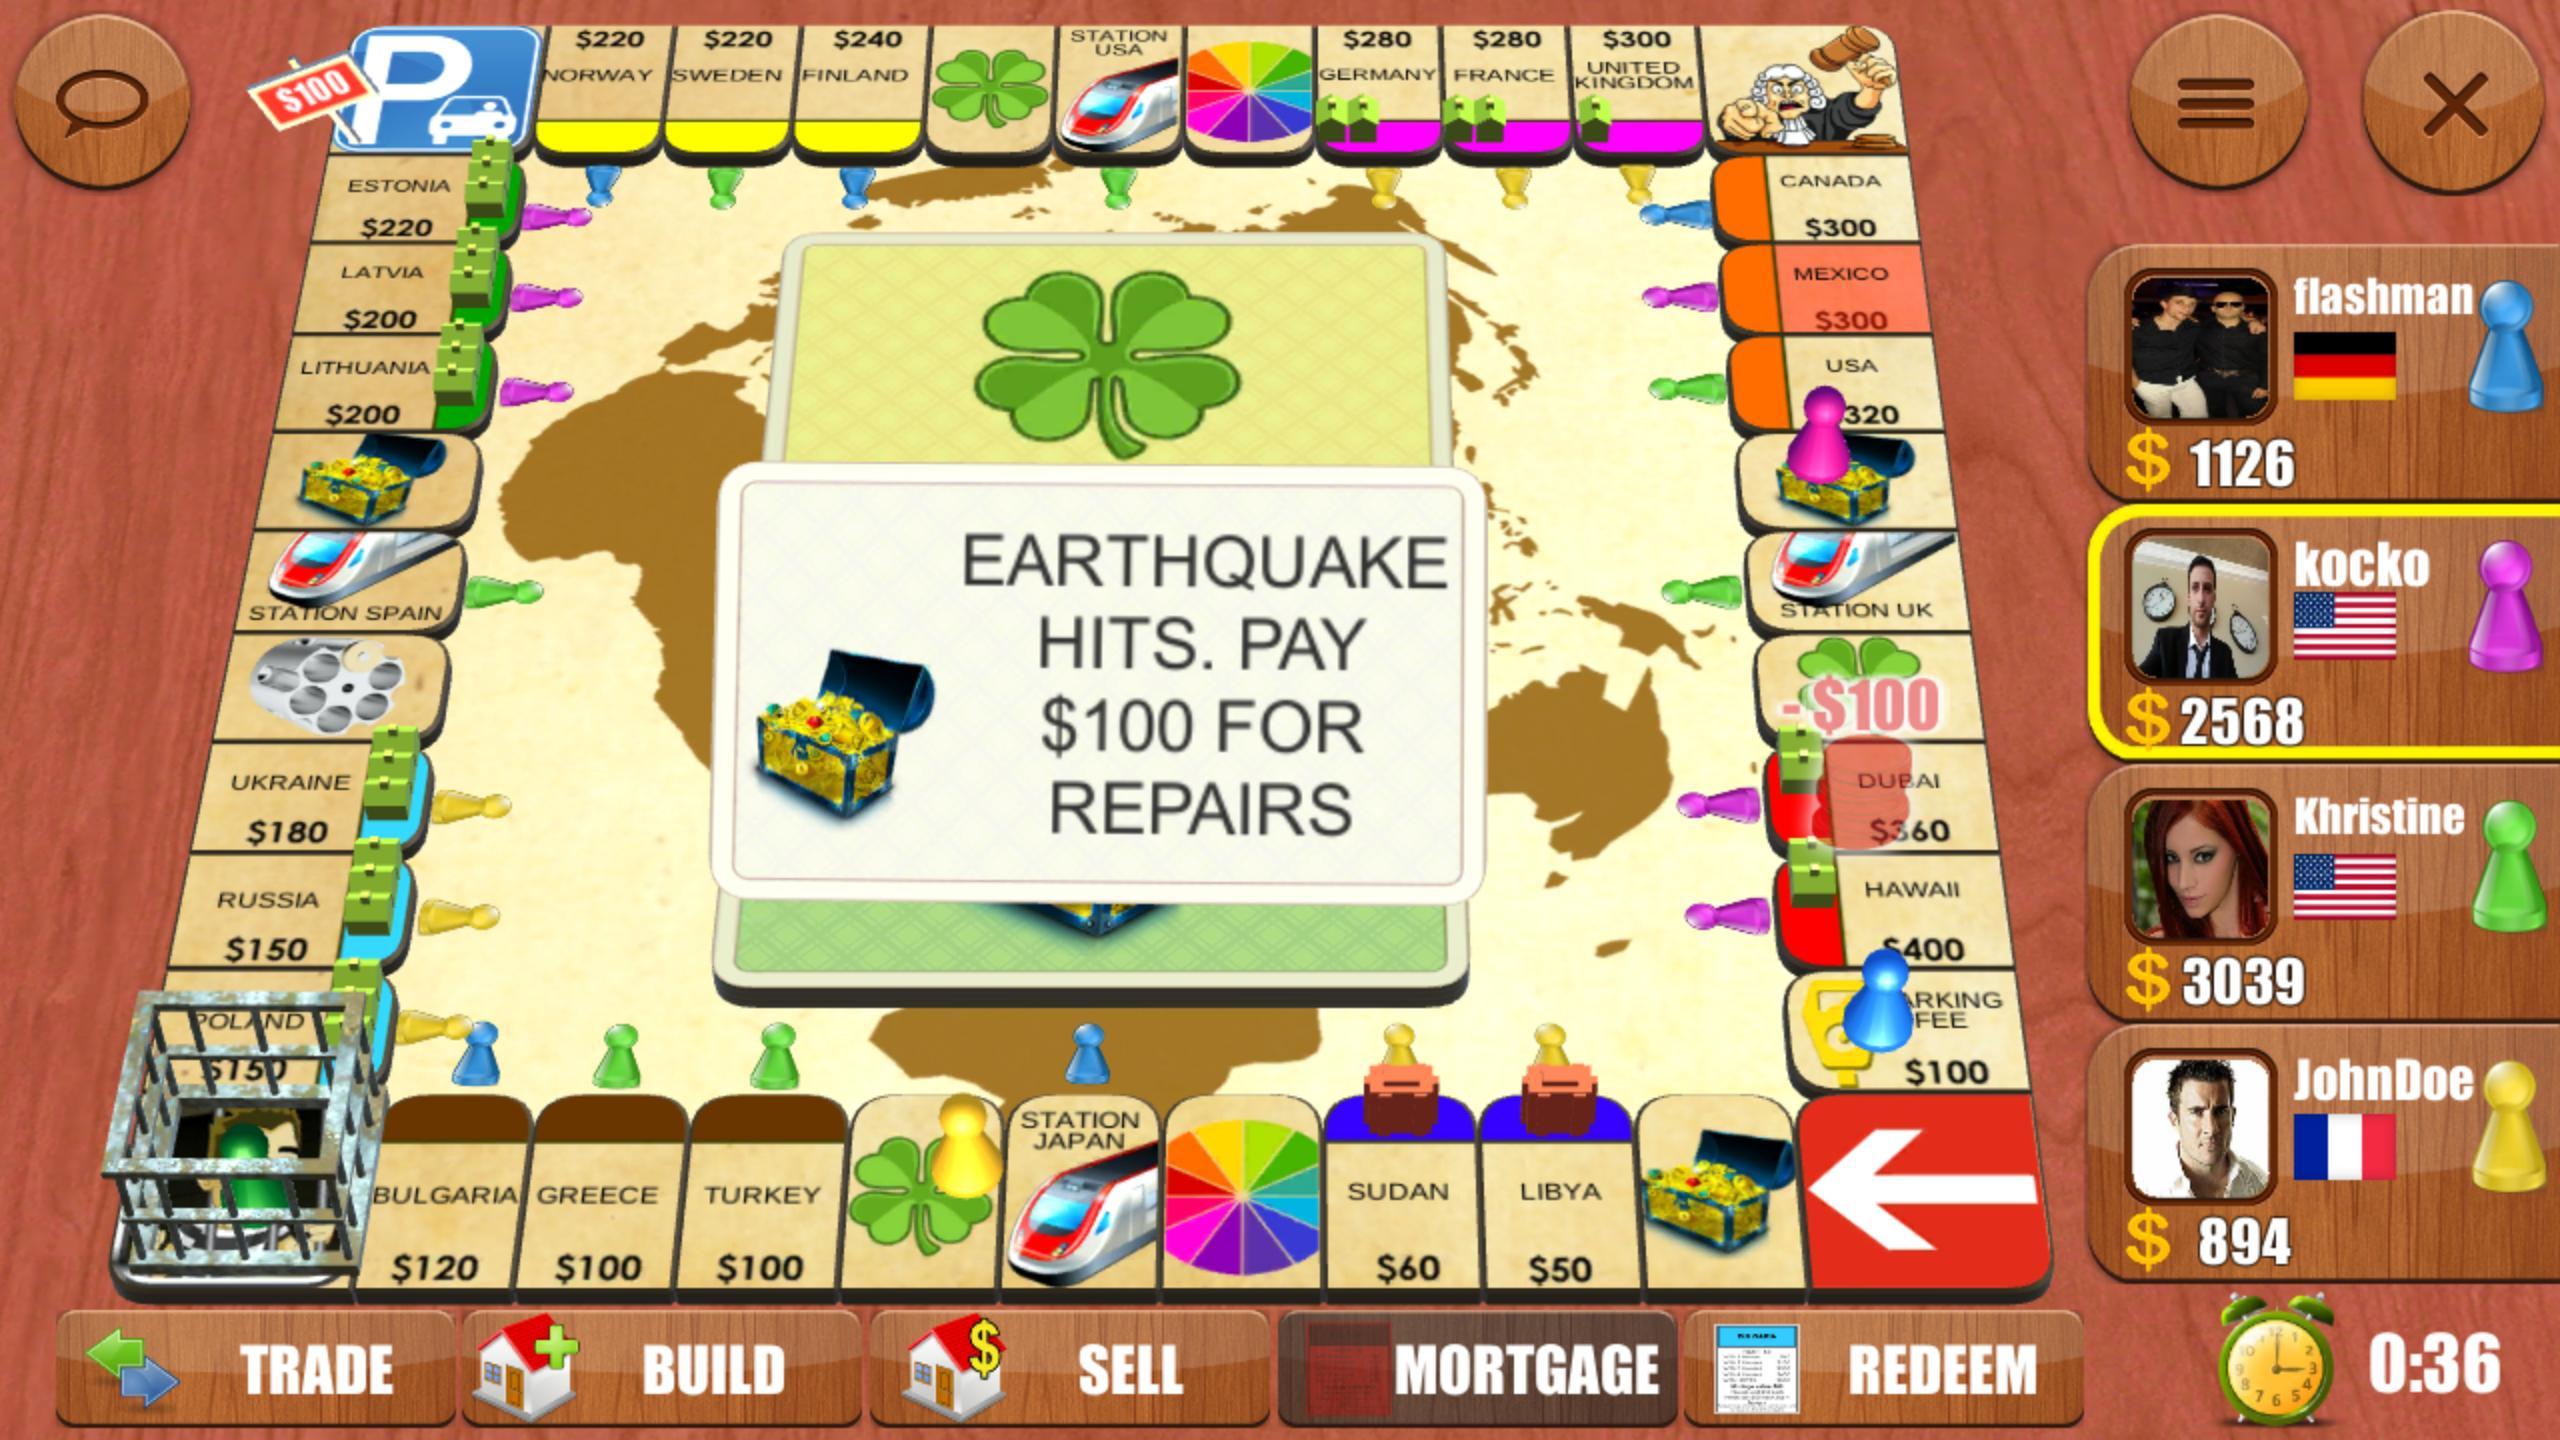 Rento Dice Board Game Online 5.1.9 Screenshot 22